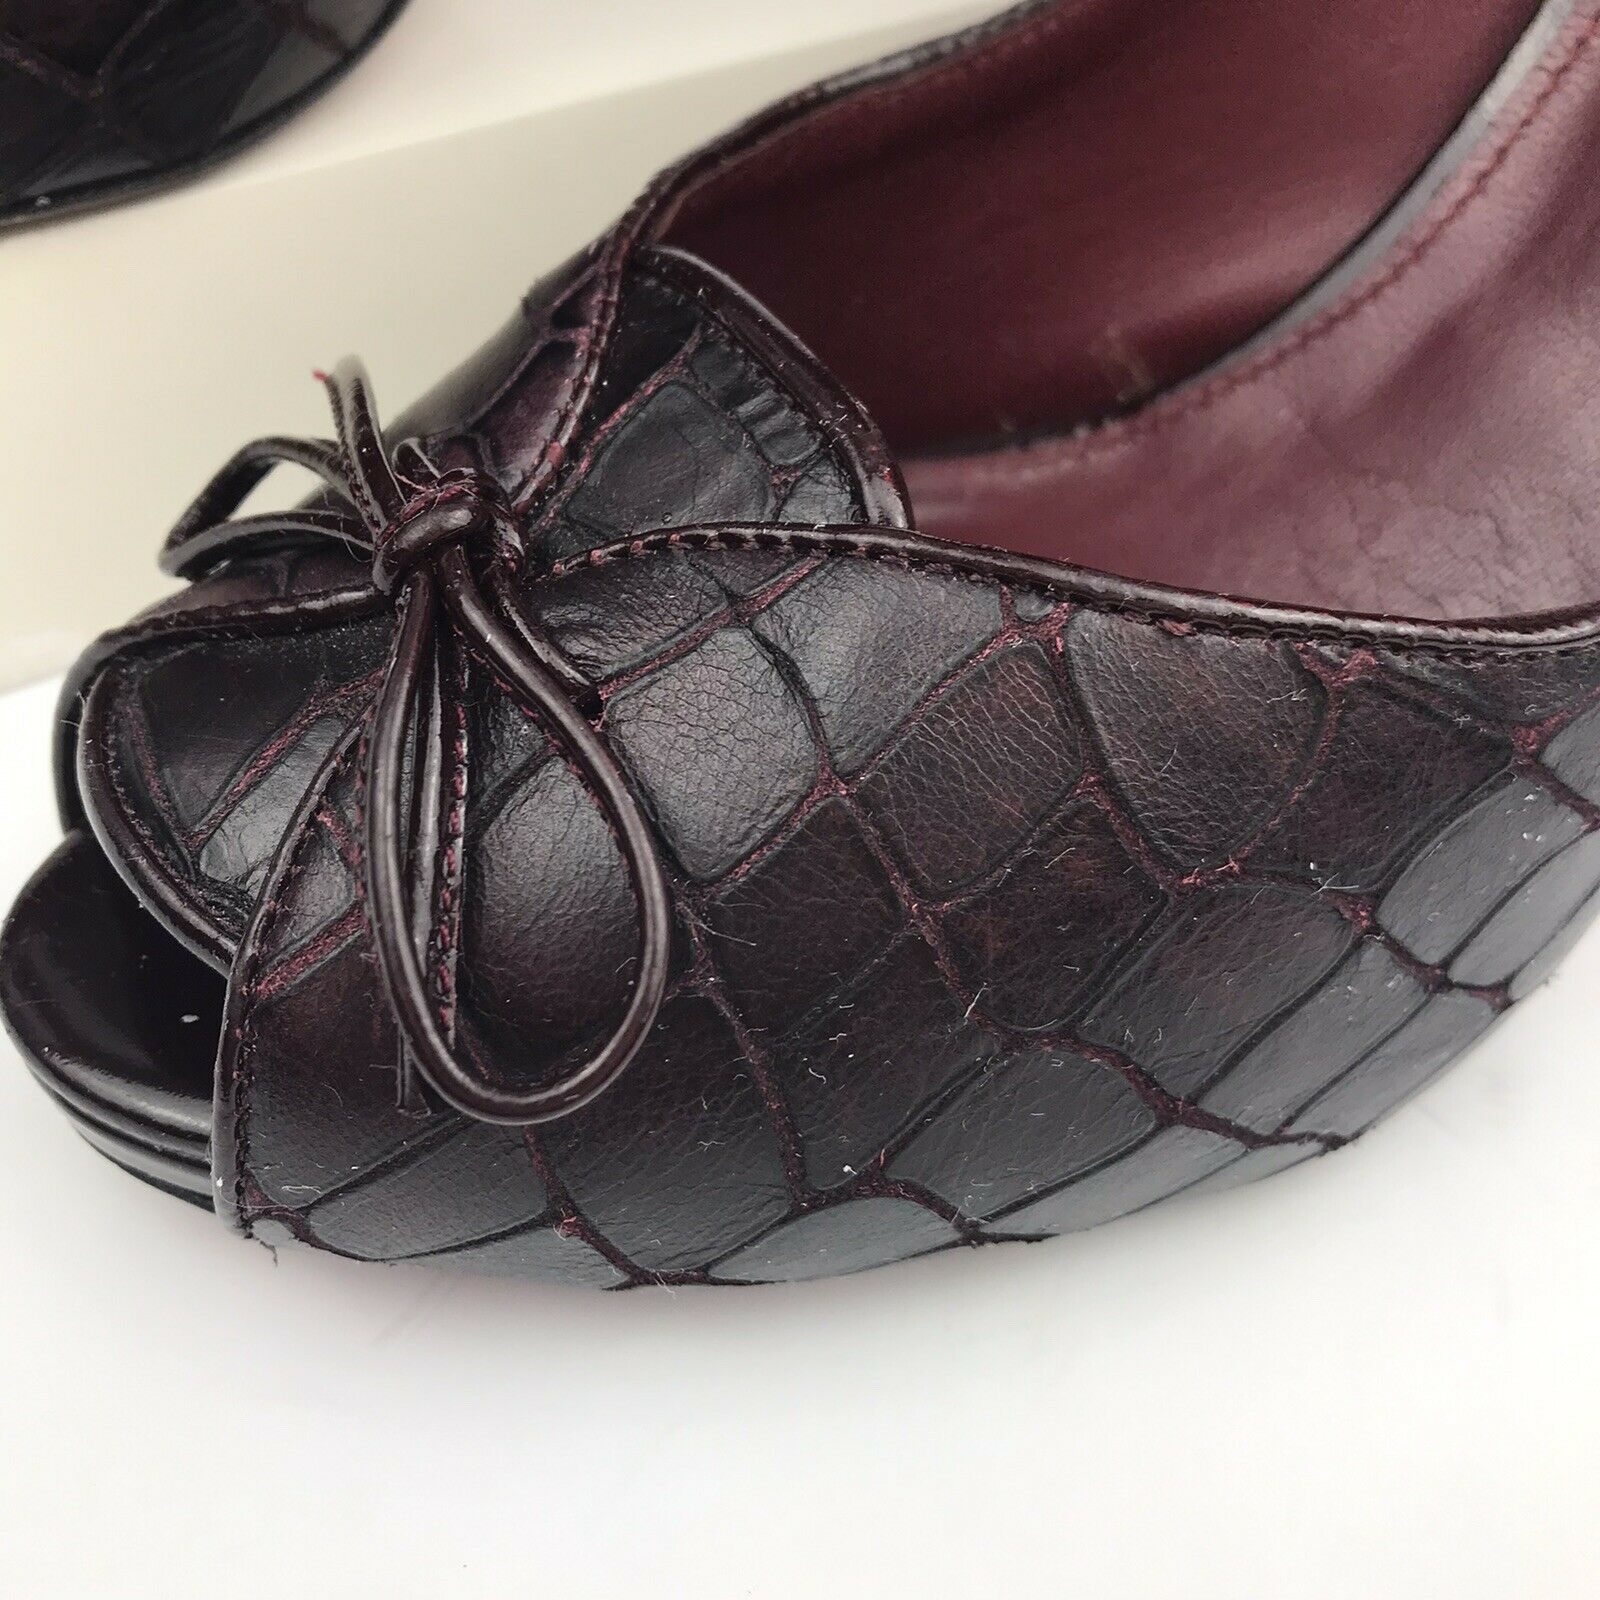 Via Spiga Burgundy Reptile Embossed Leather Peep Pumps Size 7M